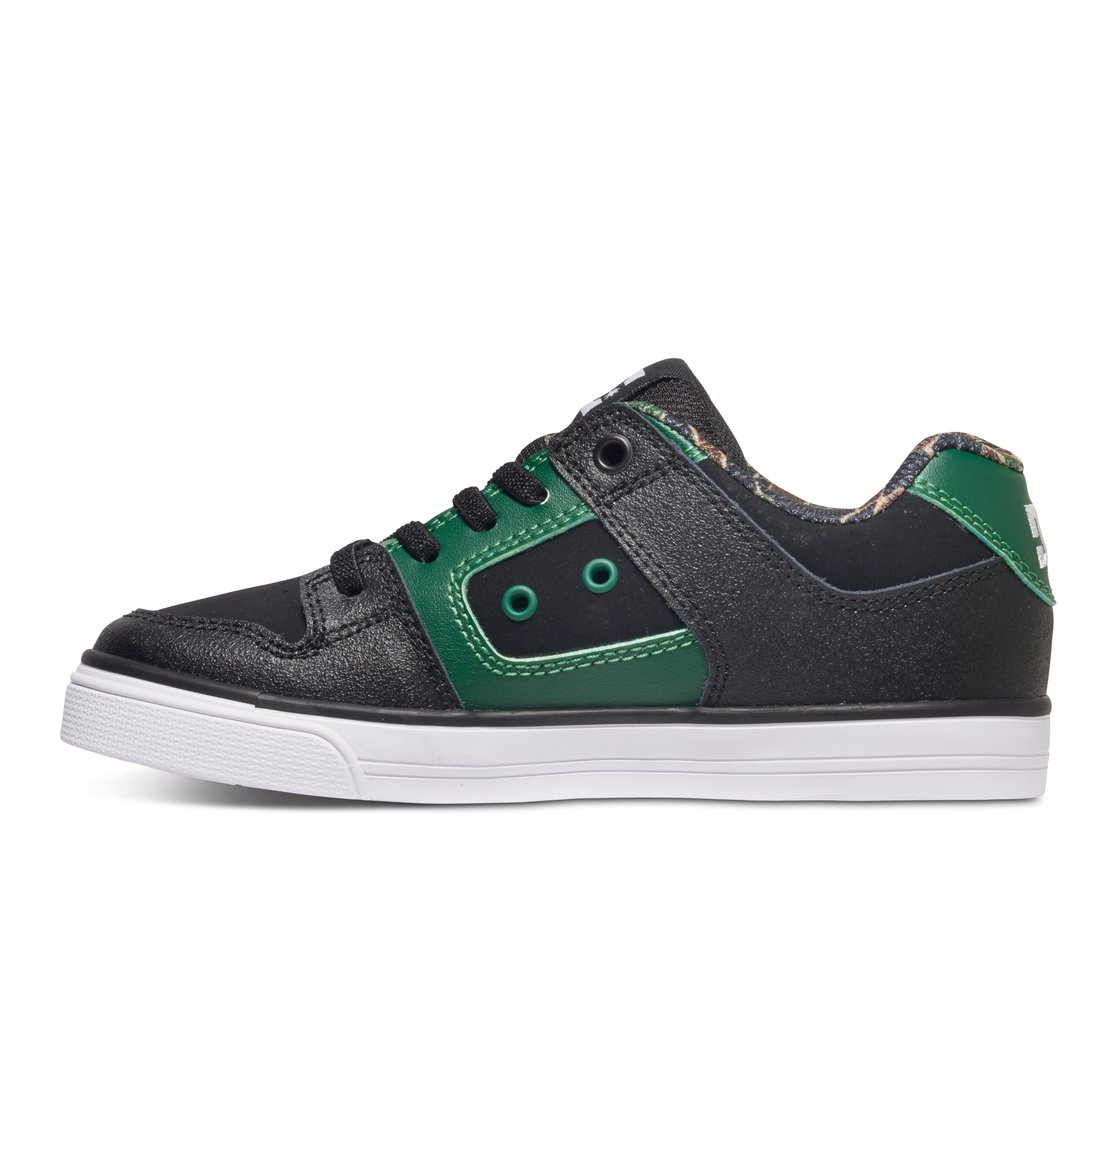 Dc Shoes Pure Elastic B Shoe, Color: Black/White/Blue, Talla: 35 EU